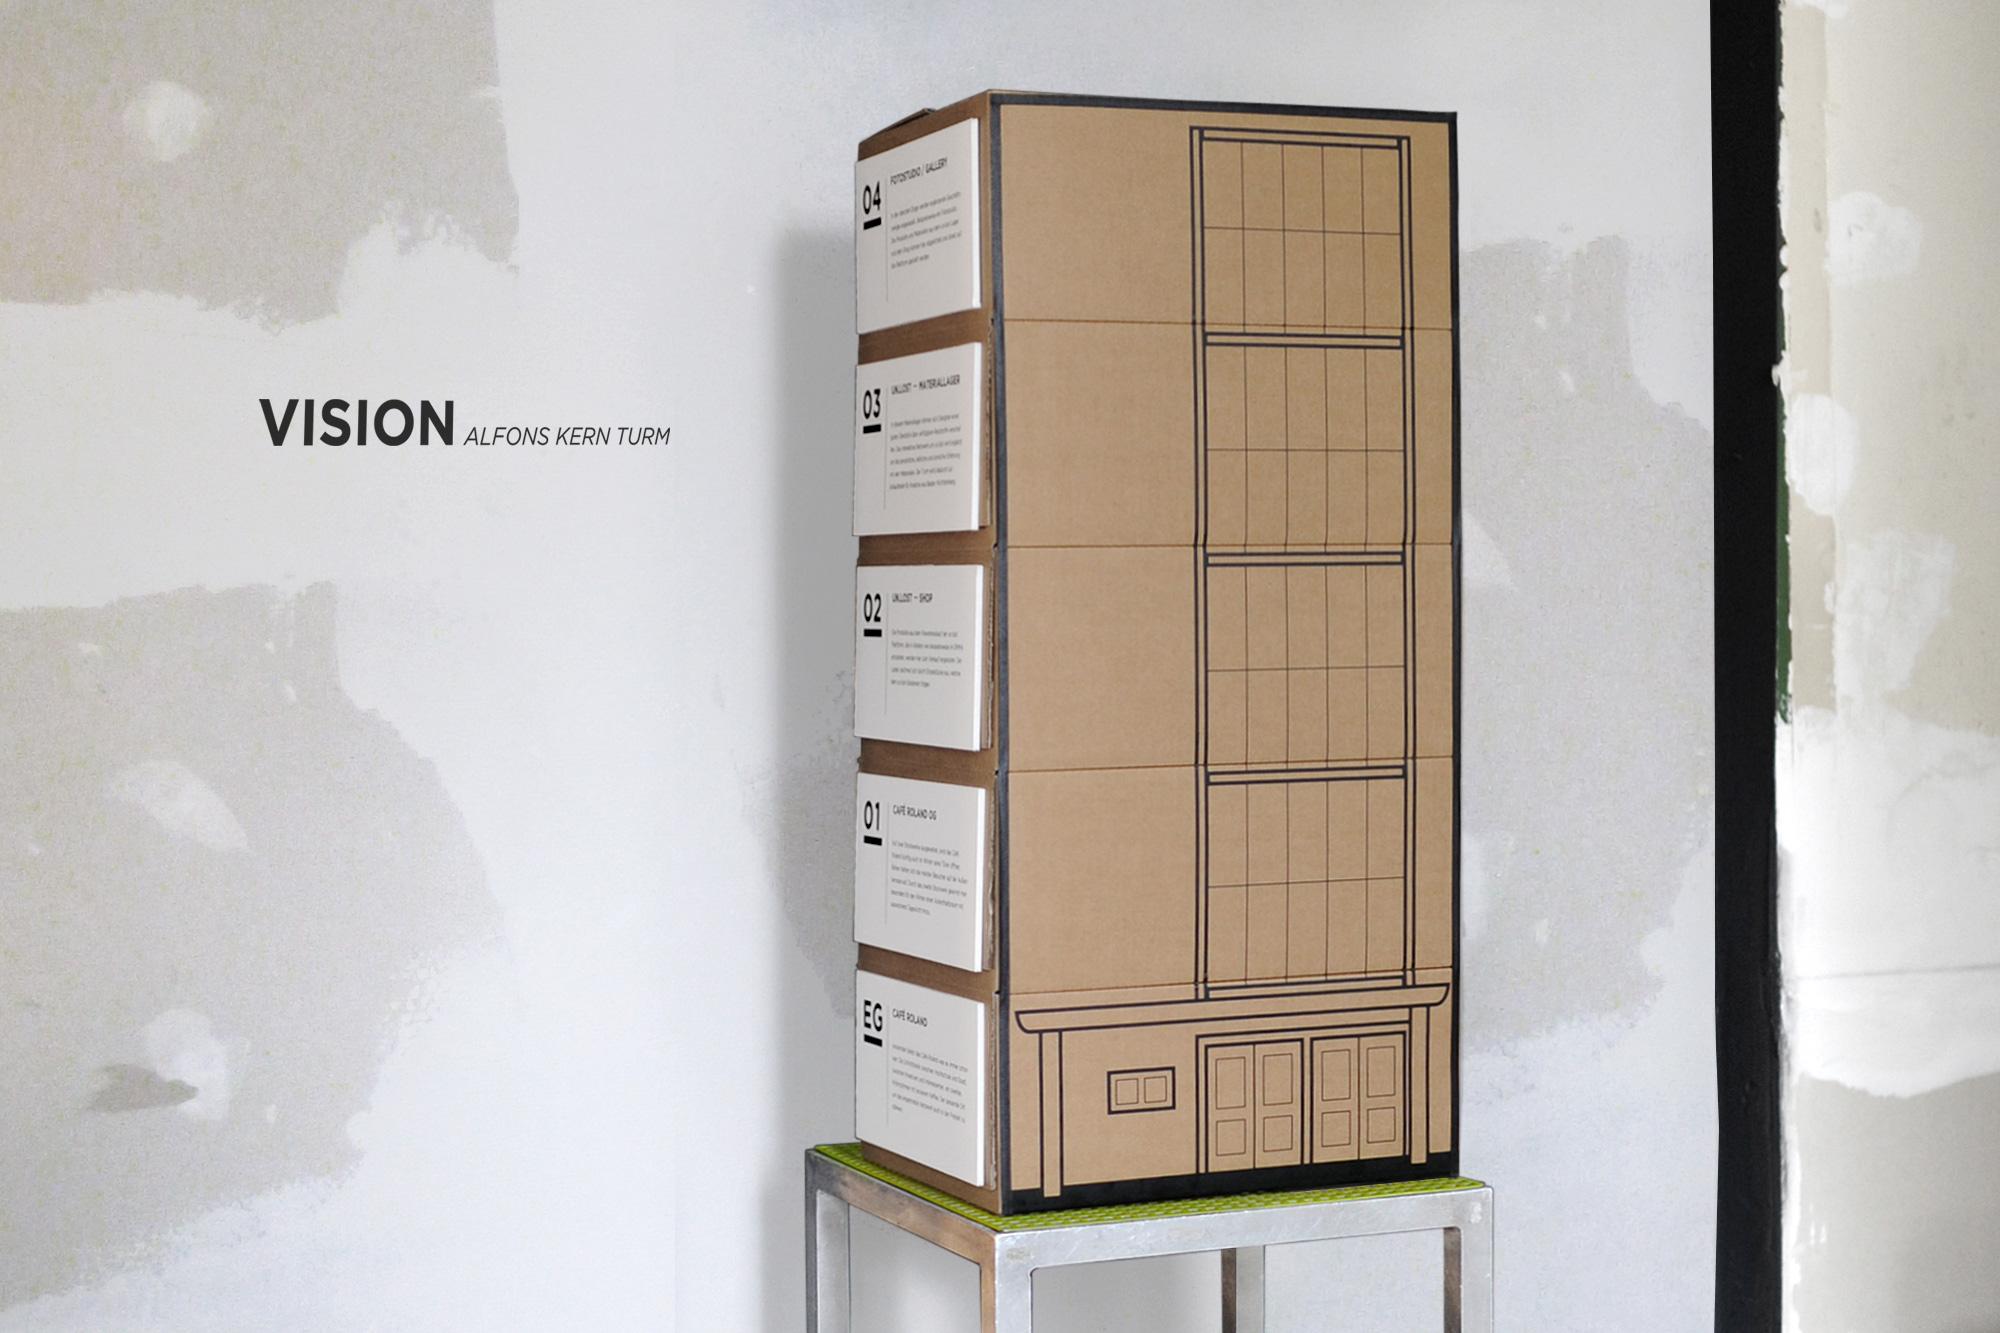 gerrit_schweiger-Young-European-Talents-Workshop-Exhibition-2013-Alfons_Kern_Turm-Vision-Zukunft-Kreativ-Pforzheim-01